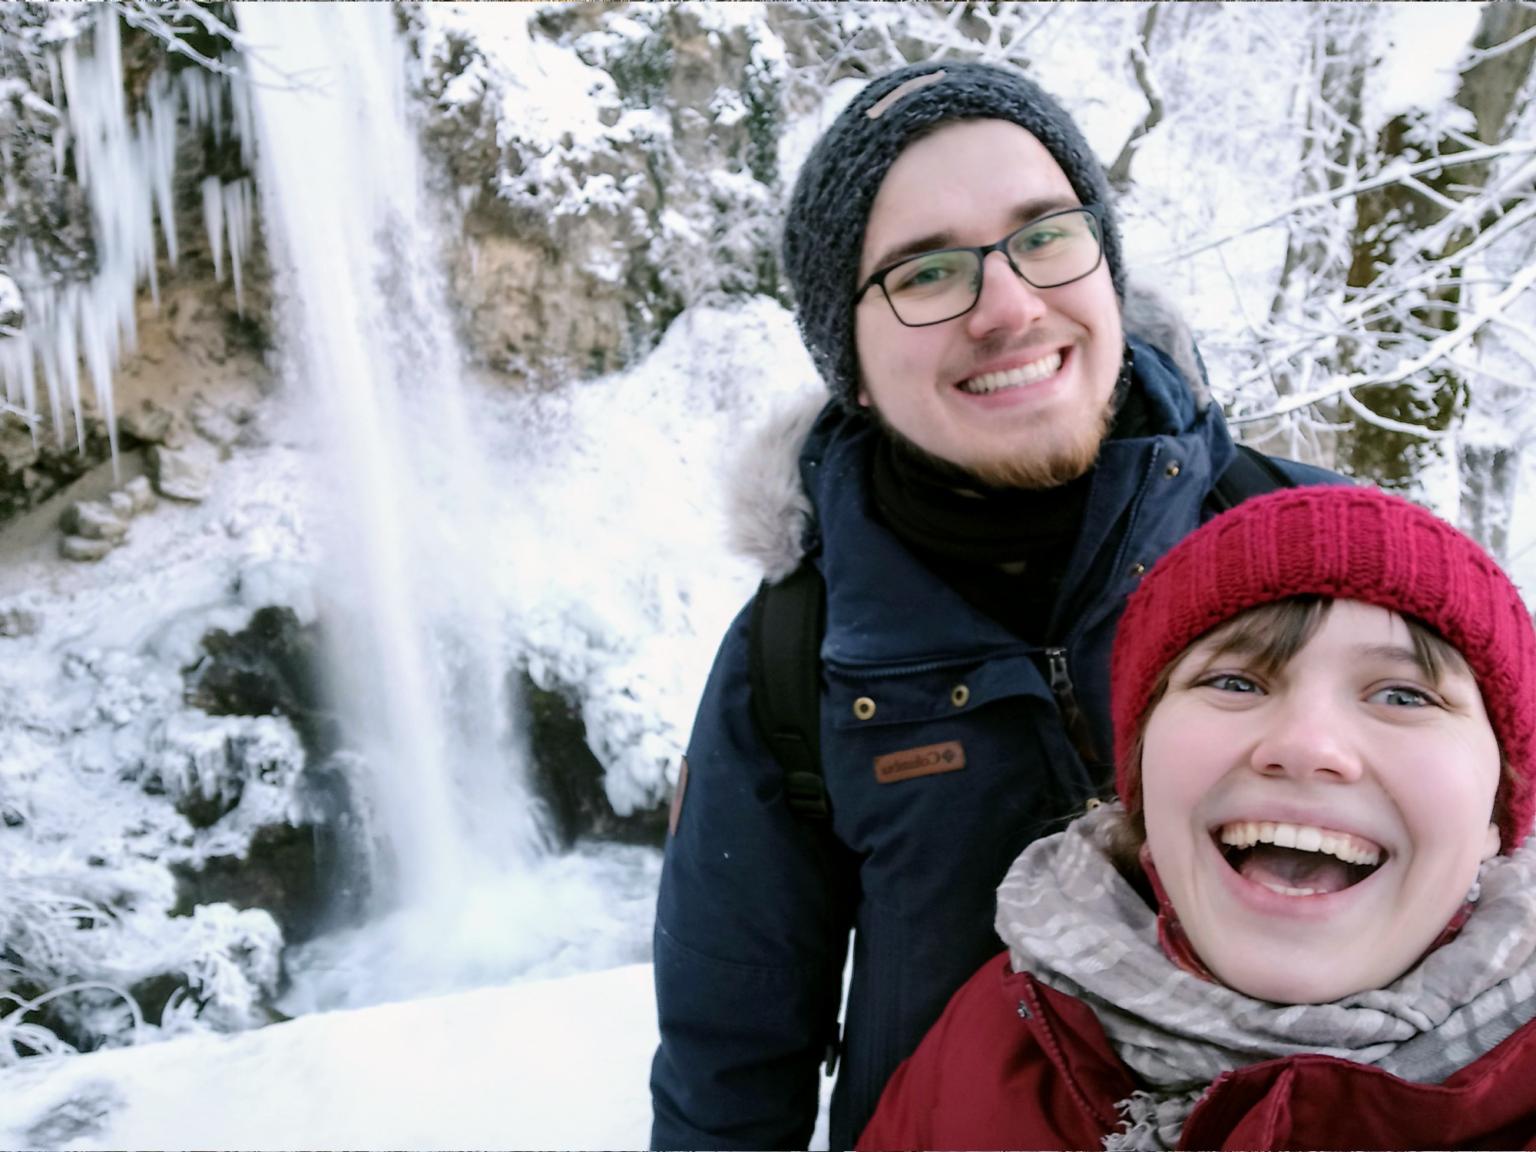 Lillafüred waterfall